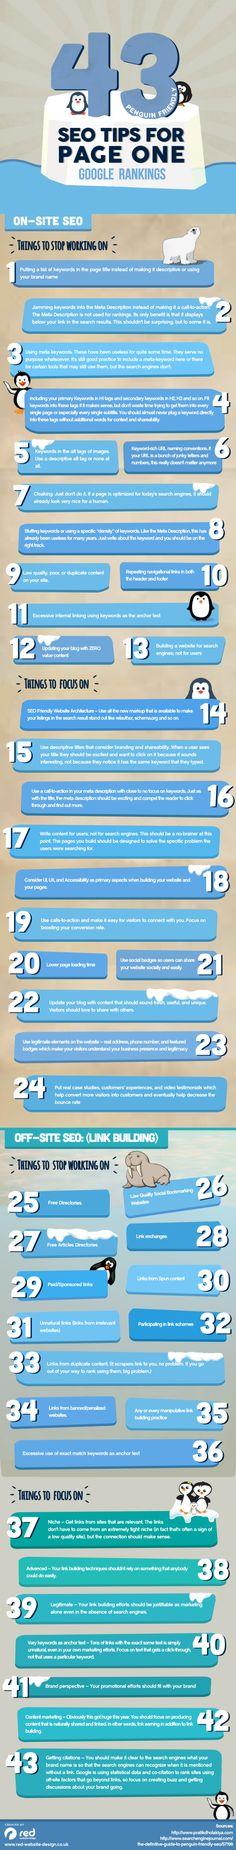 43 consejos SEO #infografia #infographic #seo